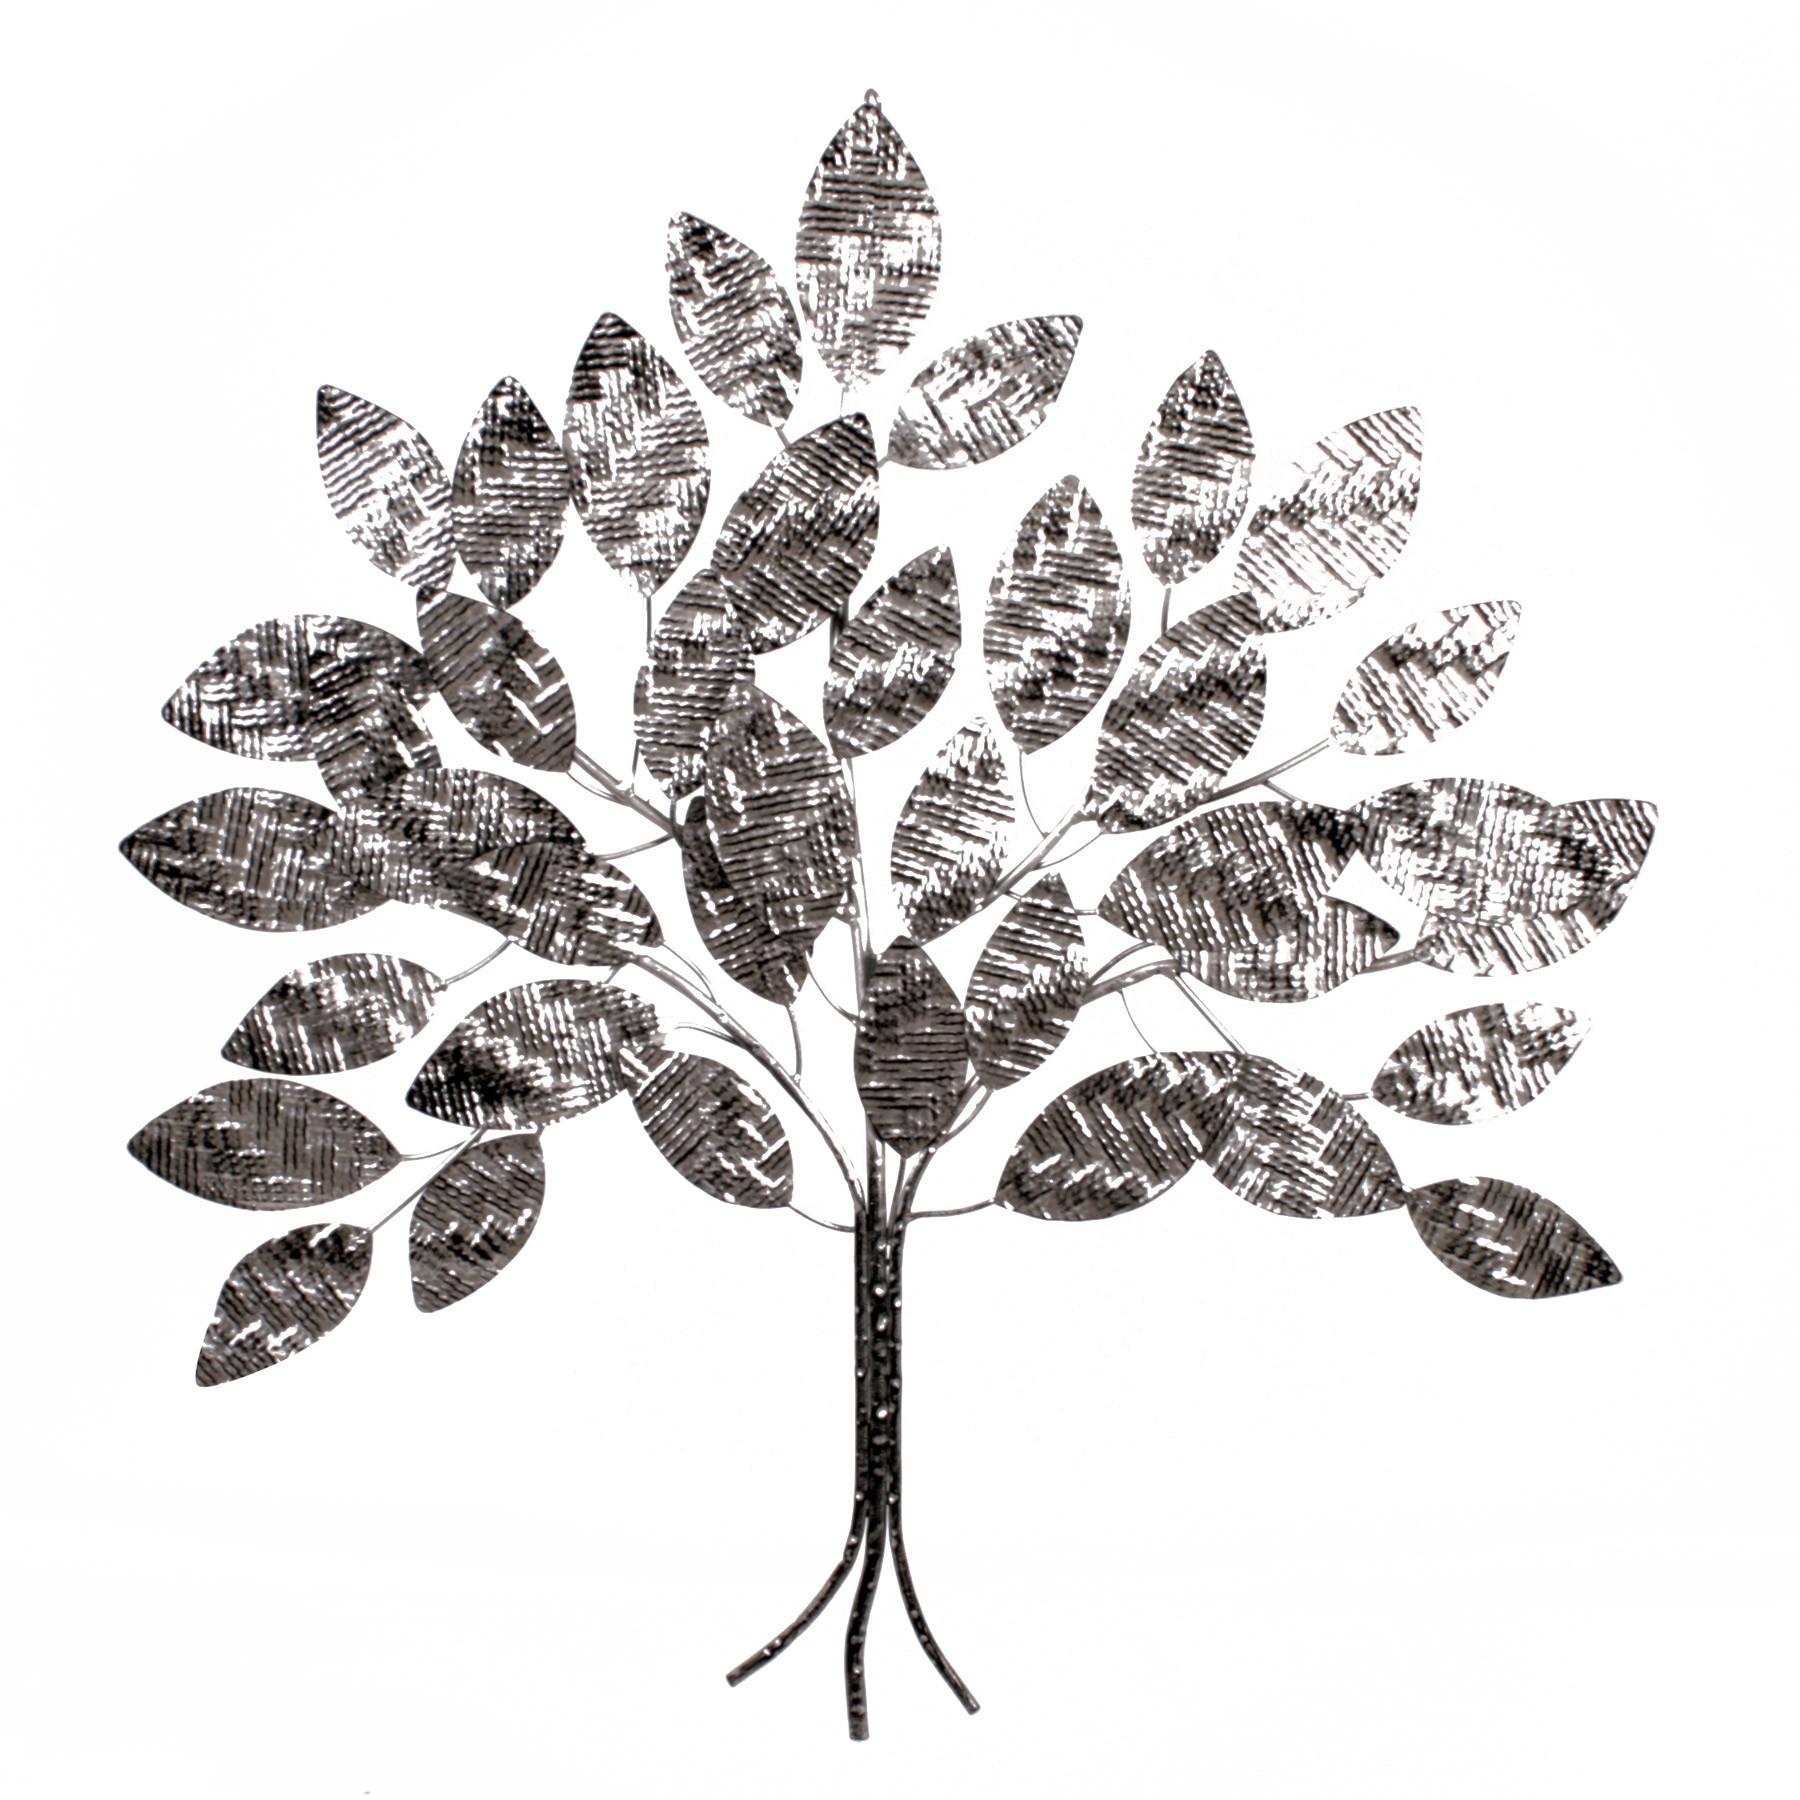 Metal Tree Wall Art Regarding Recent Metal Tree Wall Art (View 15 of 15)